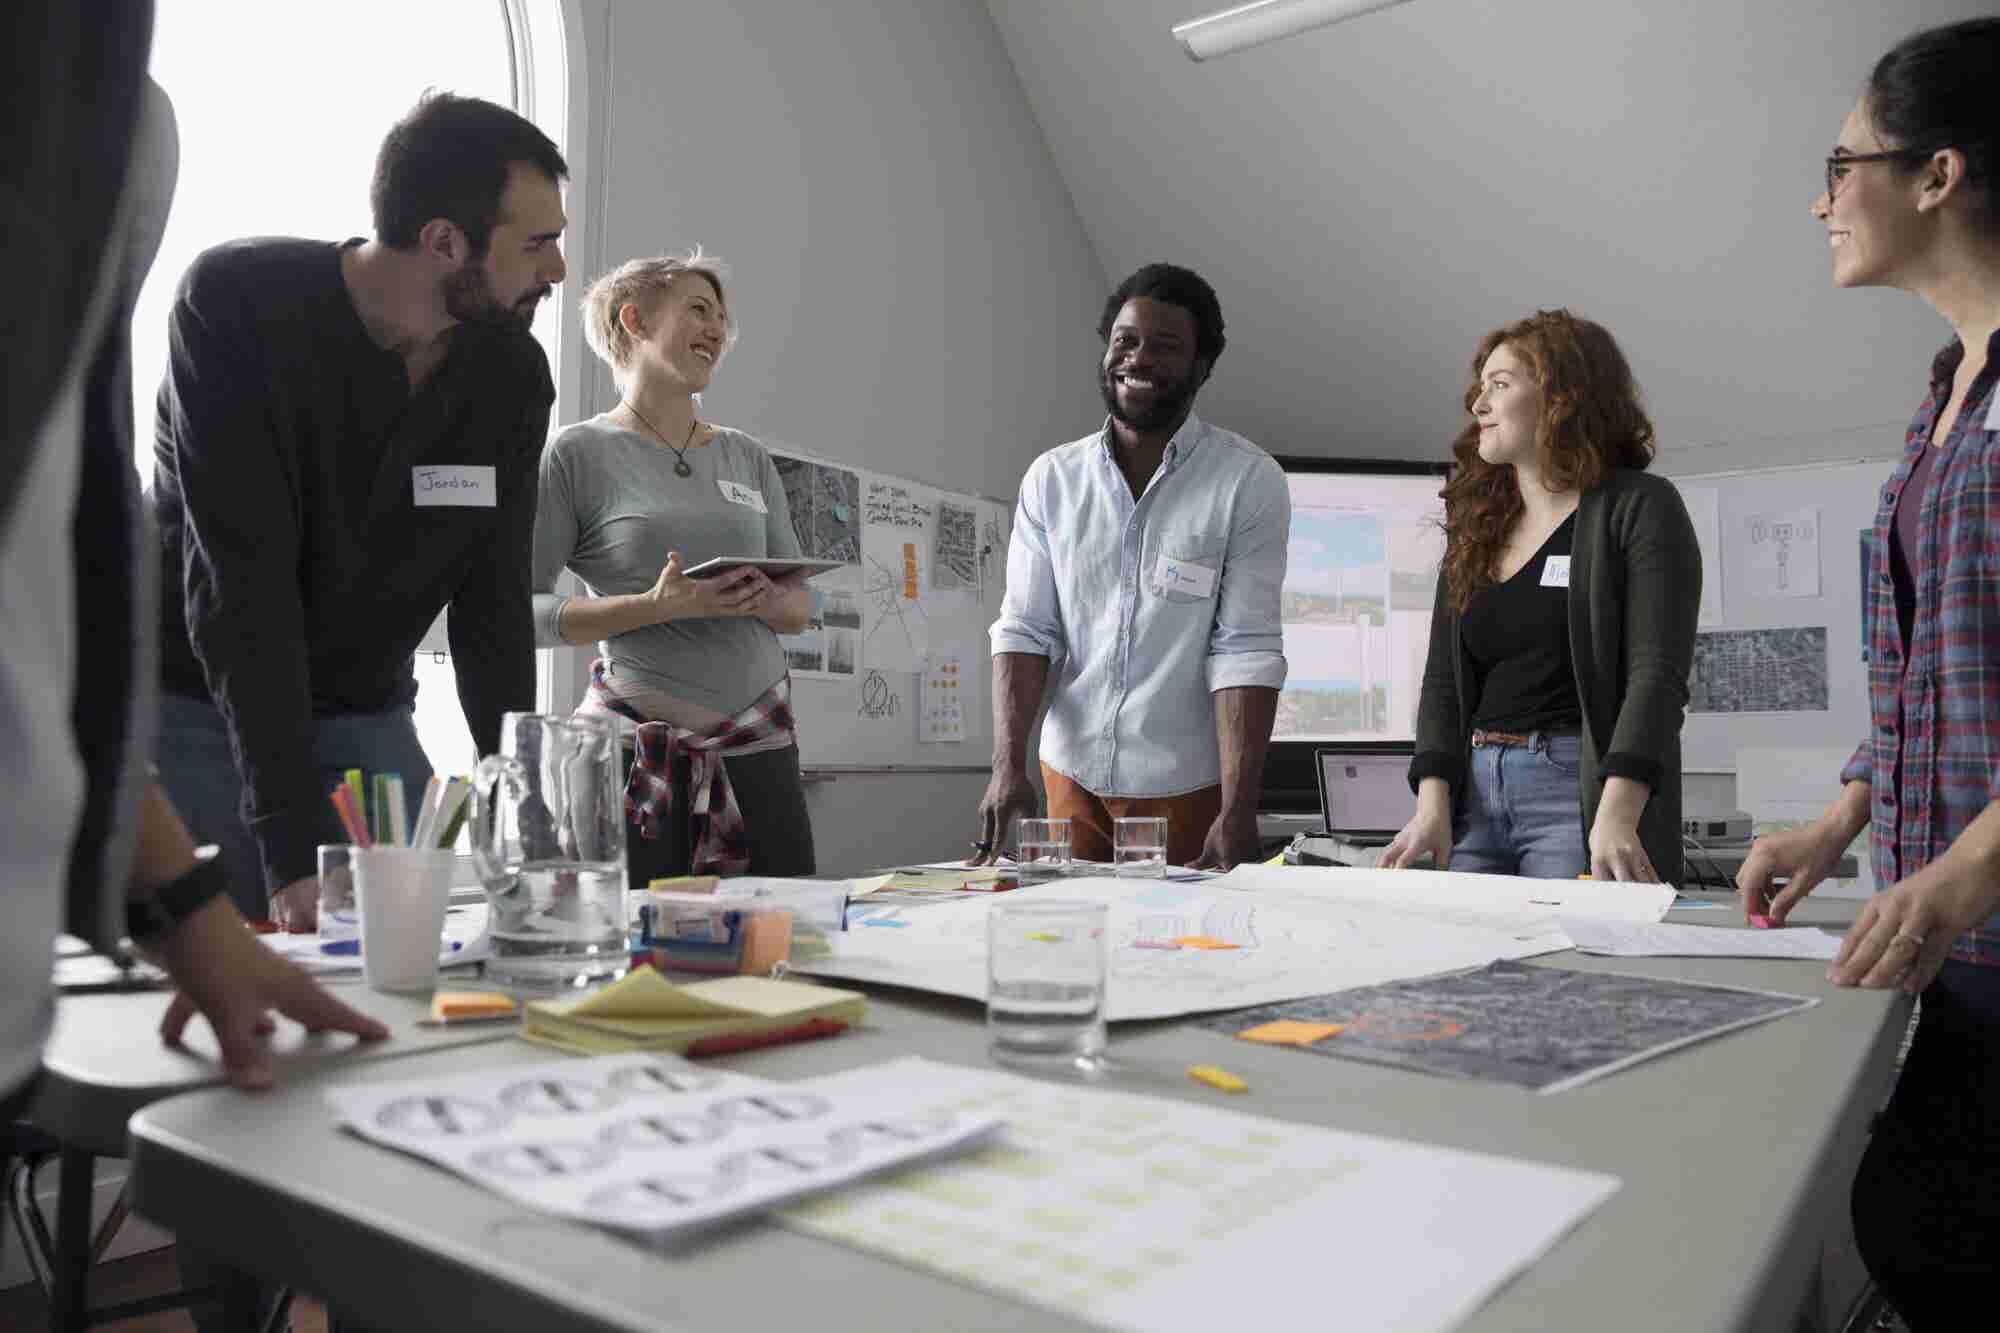 3 Fundamental Ideas on How to Succeed as an Entrepreneur